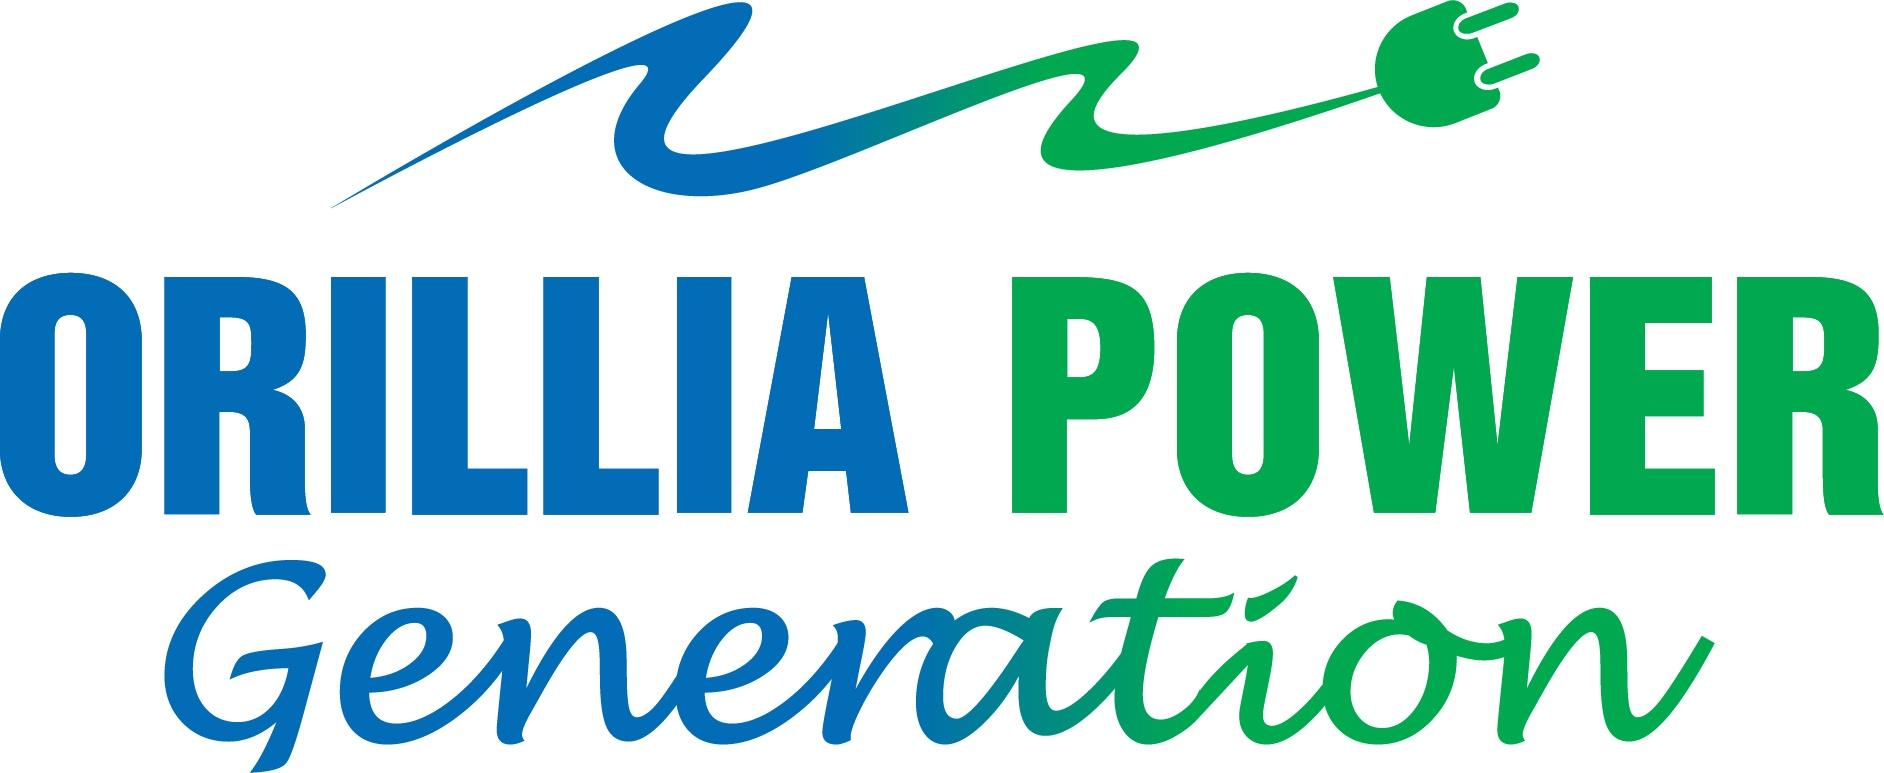 Ontario Waterpower, Waterpower Ontario, Ontario Waterpower Conference, Ontario Hydropower Conference, Ontario Hydroelectricity Conference, Ontario Energy Conference, Ontario Electricity Conference, Power of Water Canada Conference, Ontario Waterpower Association, Ontario Water Power, Ontario Hydropower, Ontario Hydro, Ontario Hydroelectric, Ontario Hydroelectricity, Ontario Energy, Ontario Water Energy, Ontario Water Electricity, Waterpower, Waterpower Industry, Hydroelectricity Industry, Hydroelectric Industry, Energy Industry, Hydro Industry, Hydroelectricity, Hydroelectric, Hydro, Water Energy, Energy, Waterpower Industry, Waterpower Association, Canadian Waterpower, Canada Waterpower, Ontario Hydropower Association, Canadian Waterpower Conference, Waterpower Conference, Waterpower Tradeshow, Hydroelectricity Tradeshow, Hydro Tradeshow, Hydropower Tradeshow, Ontario Conference, Ontario Tradeshow, Orillia Power, Orillia